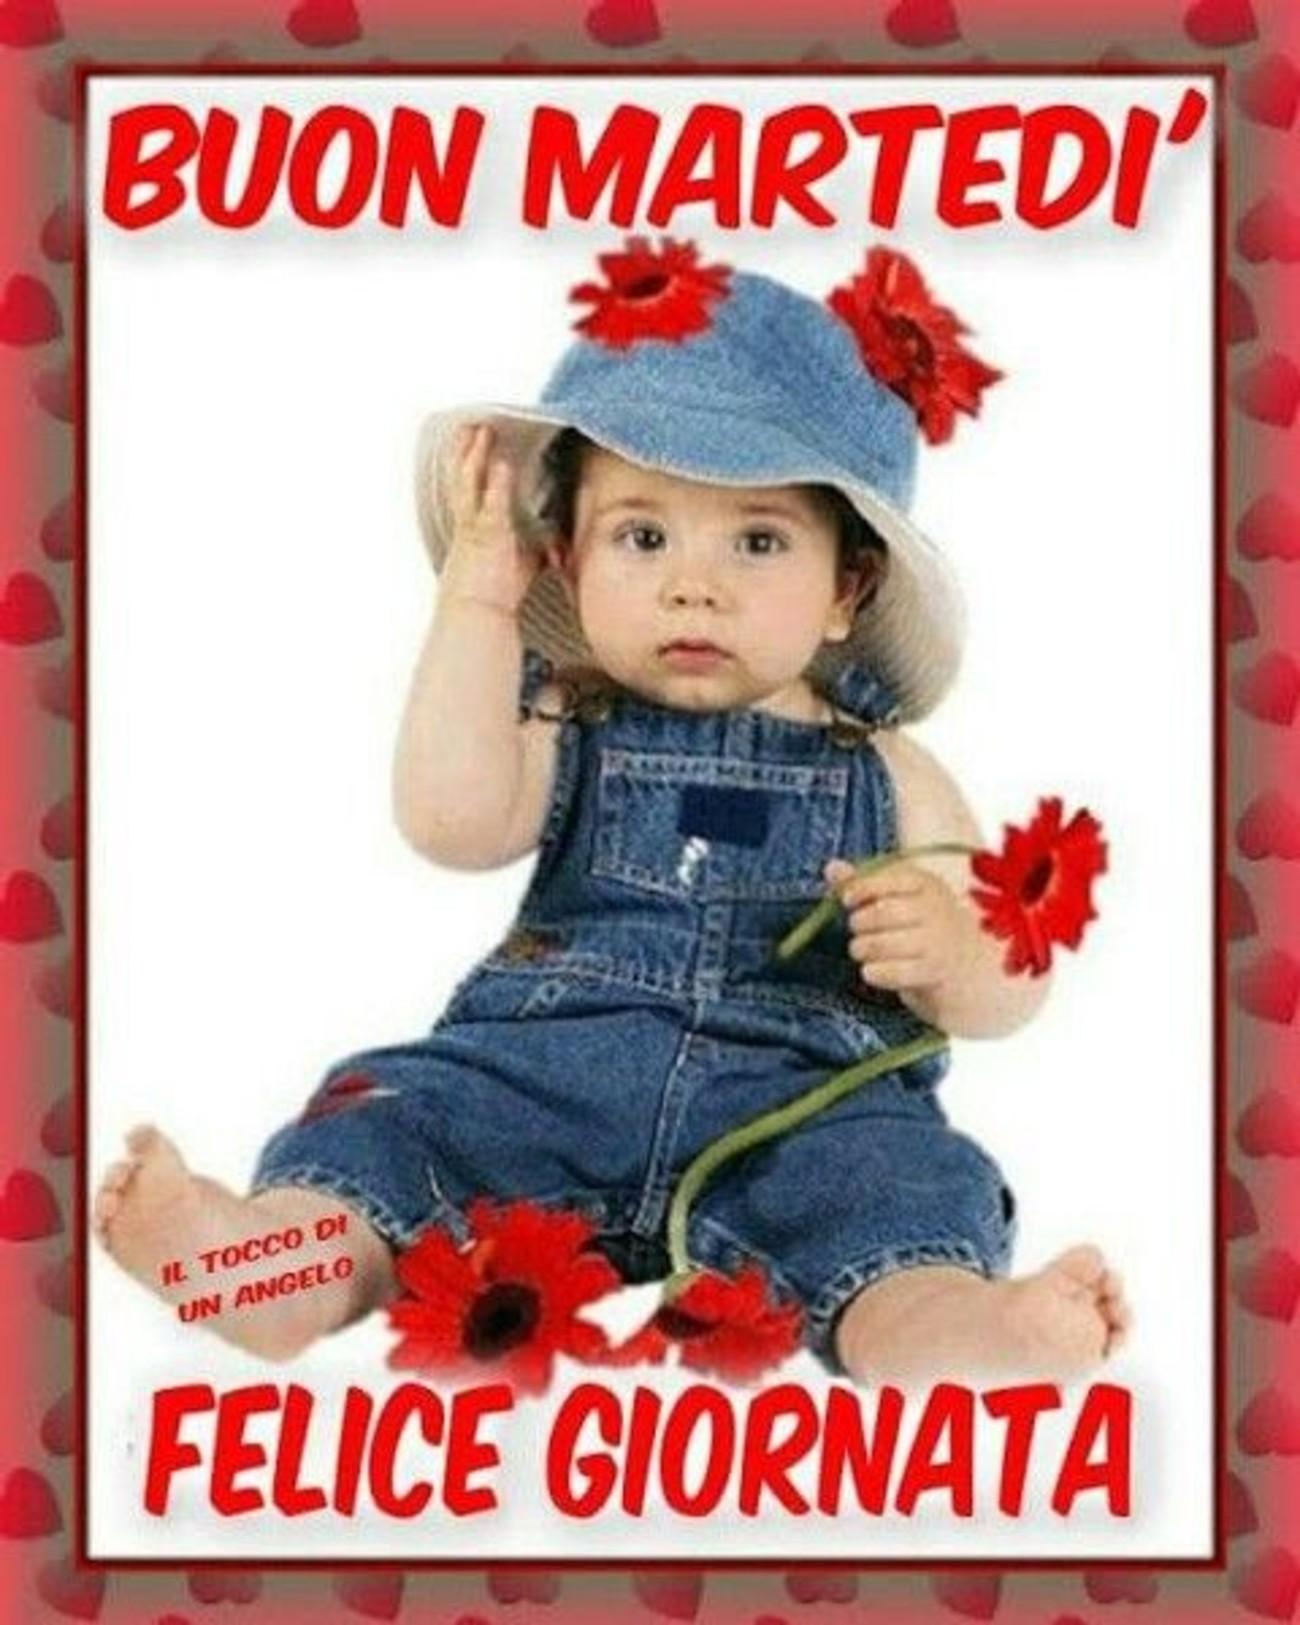 Buon Martedi Immagini Per Facebook 4691 Immaginifacebook It